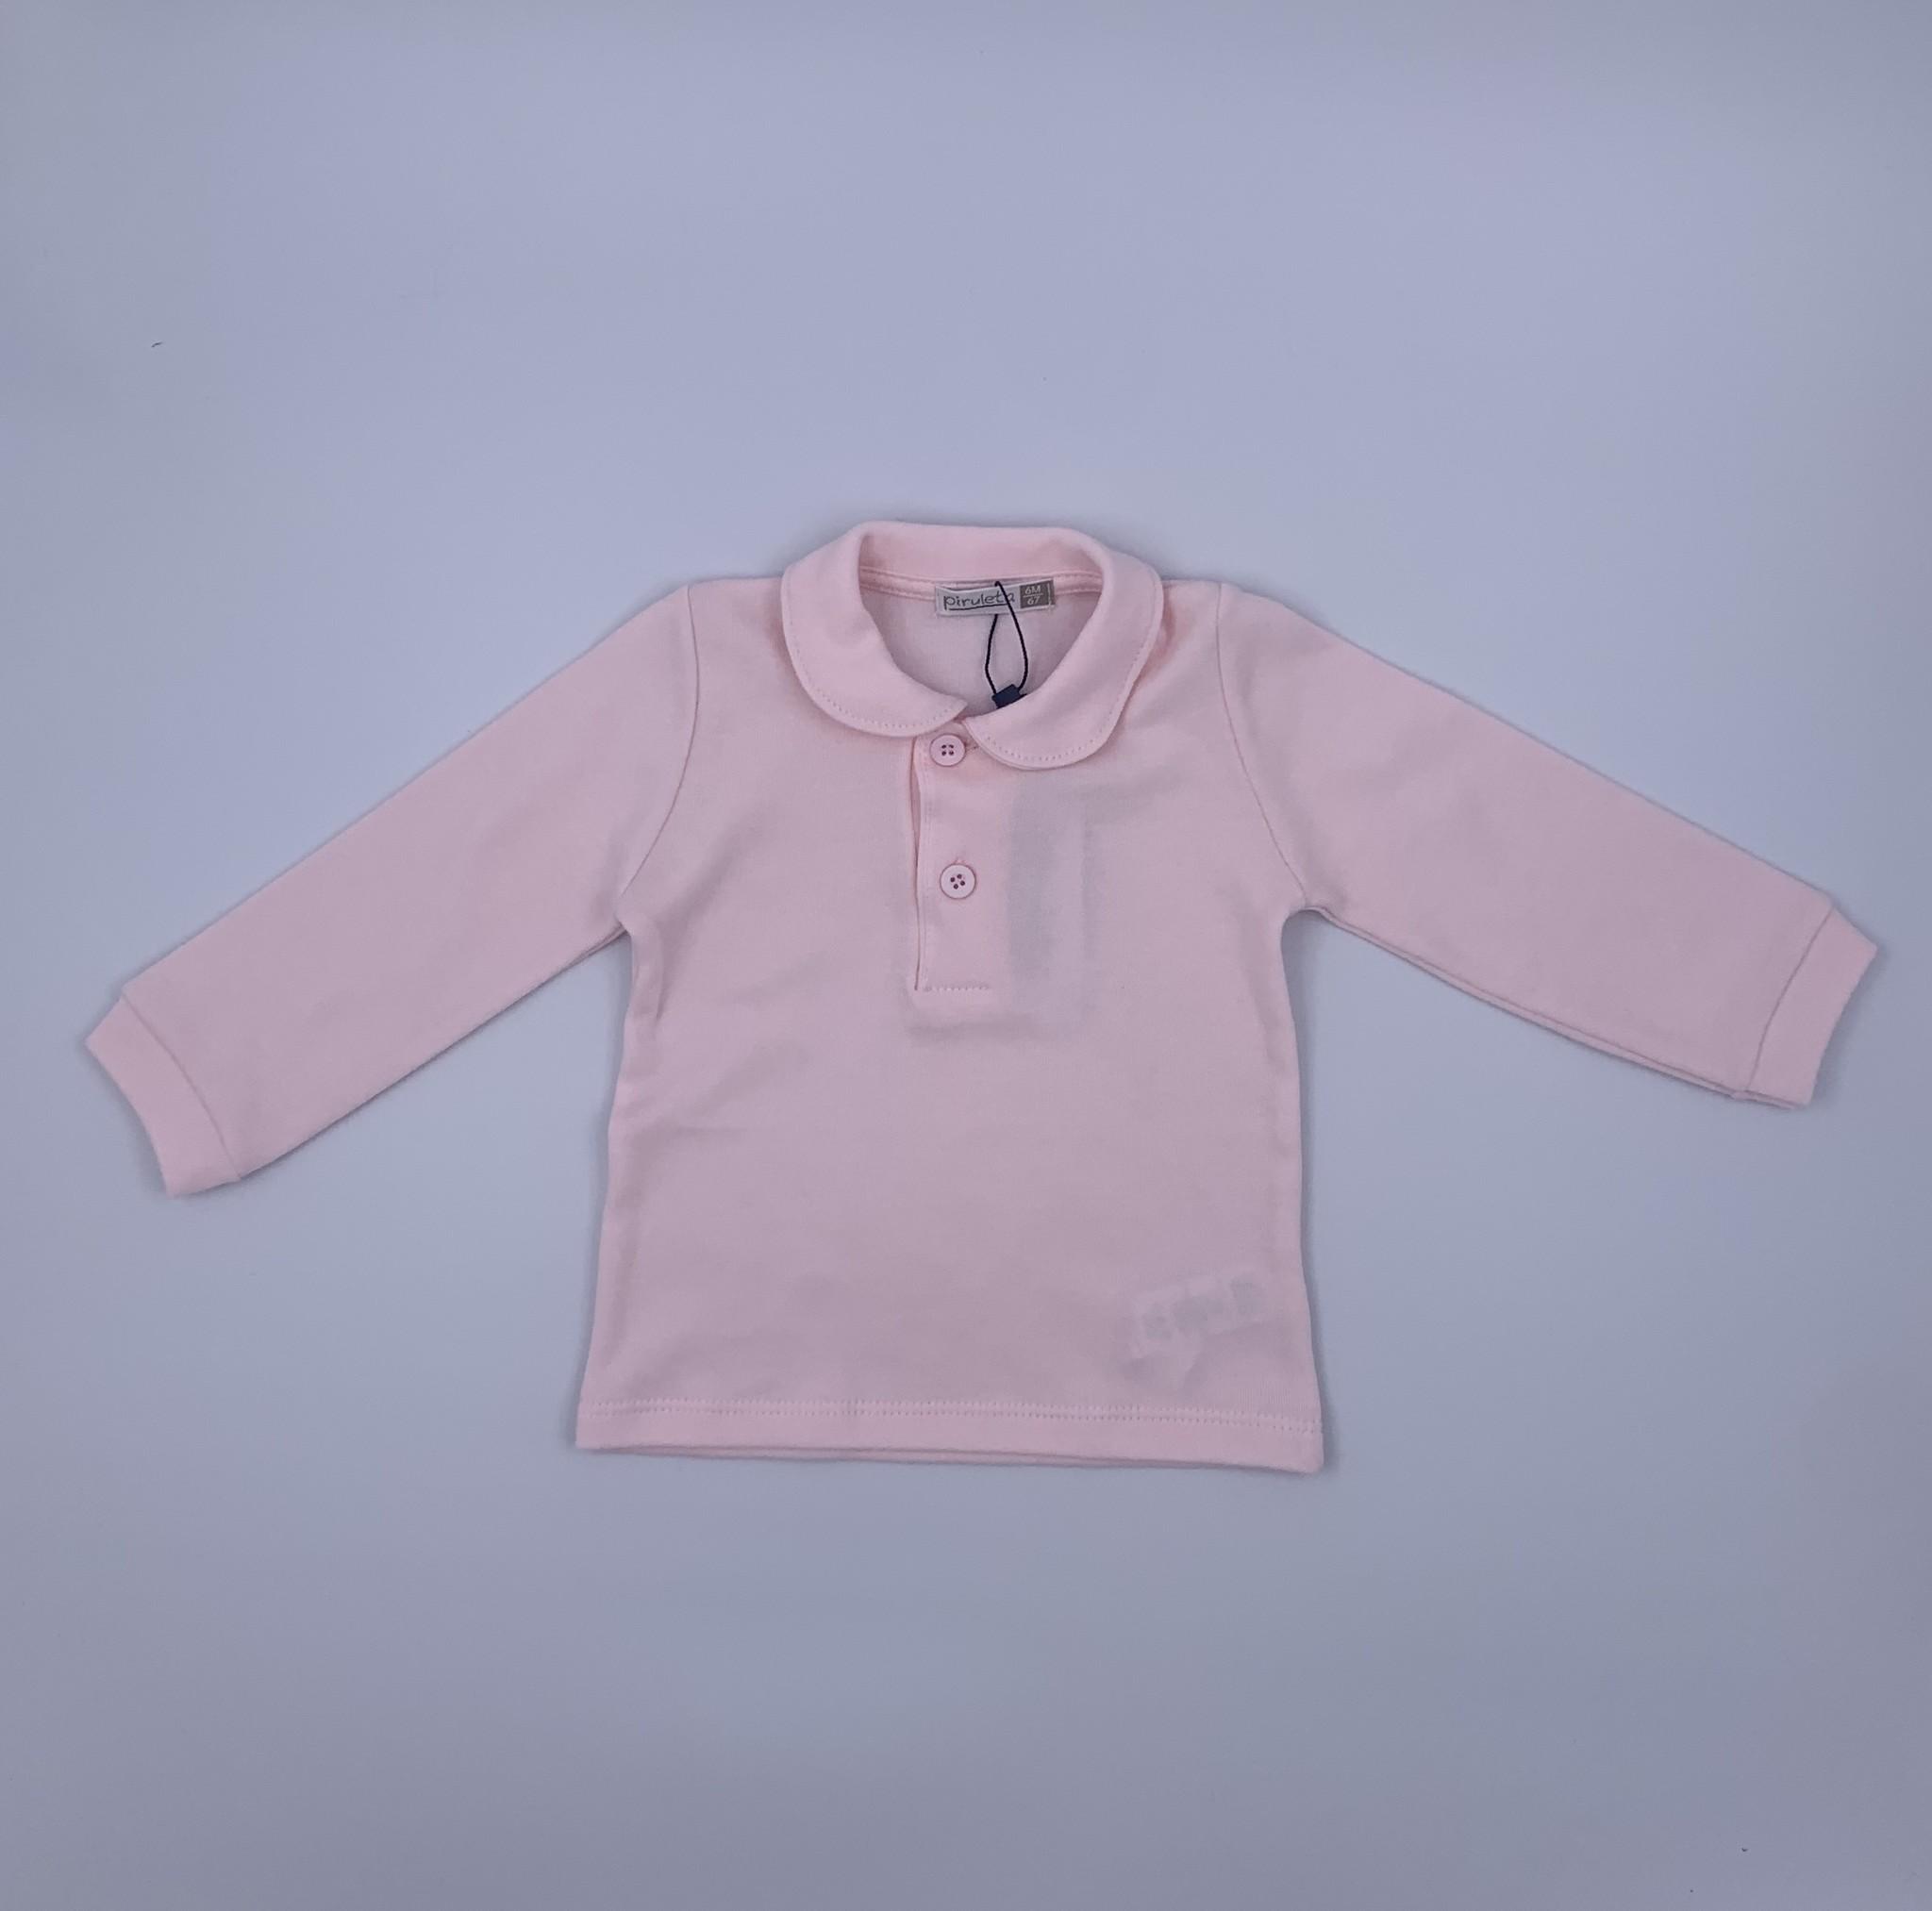 Piruleta Piruleta Pale Pink Button Front Top